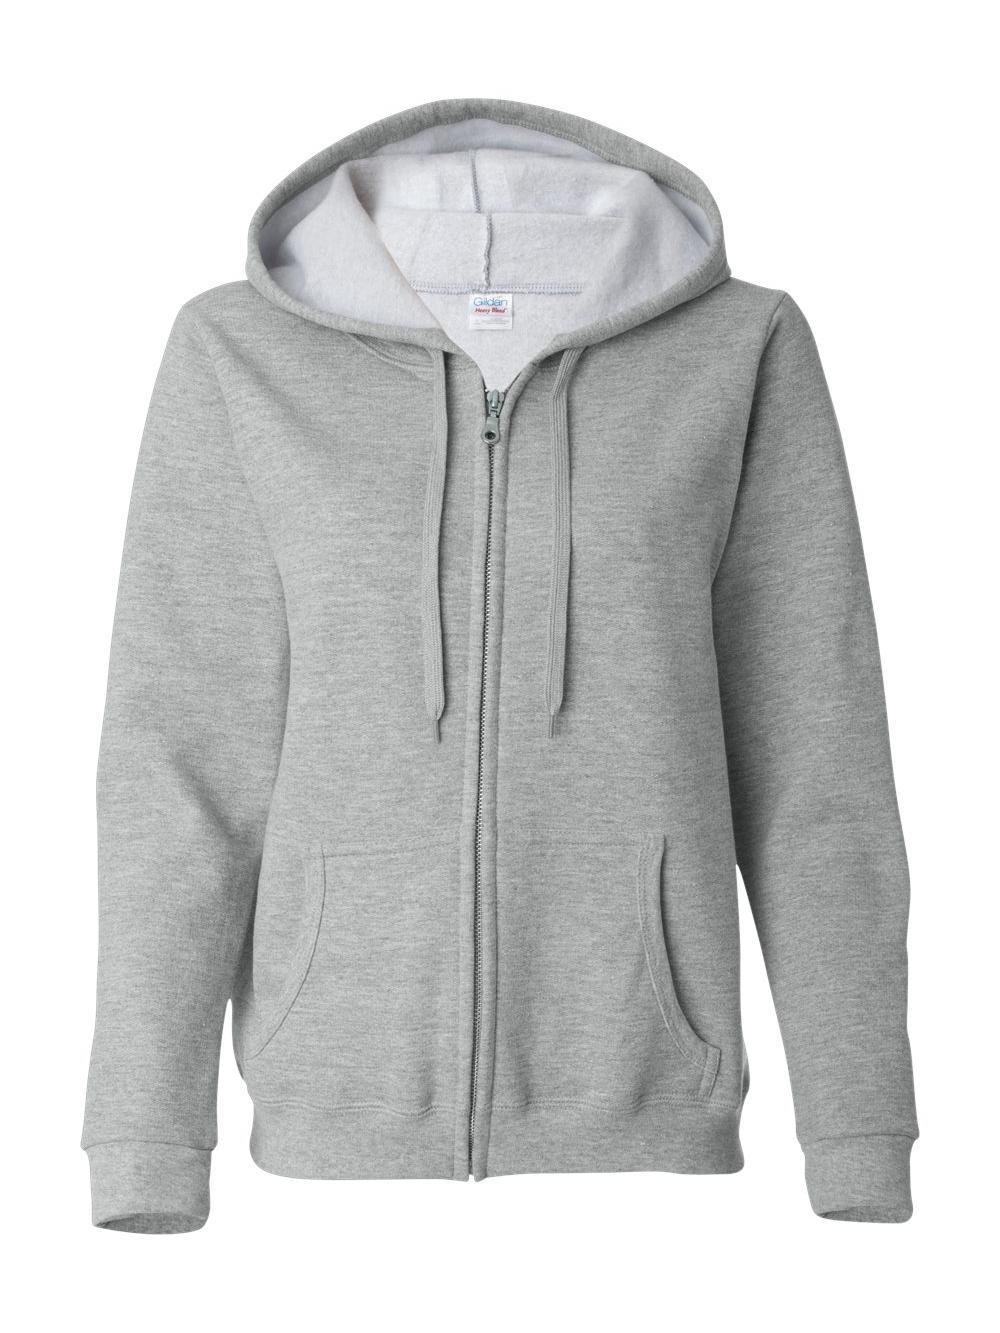 Gildan-Heavy-Blend-Women-039-s-Full-Zip-Hooded-Sweatshirt-18600FL thumbnail 12